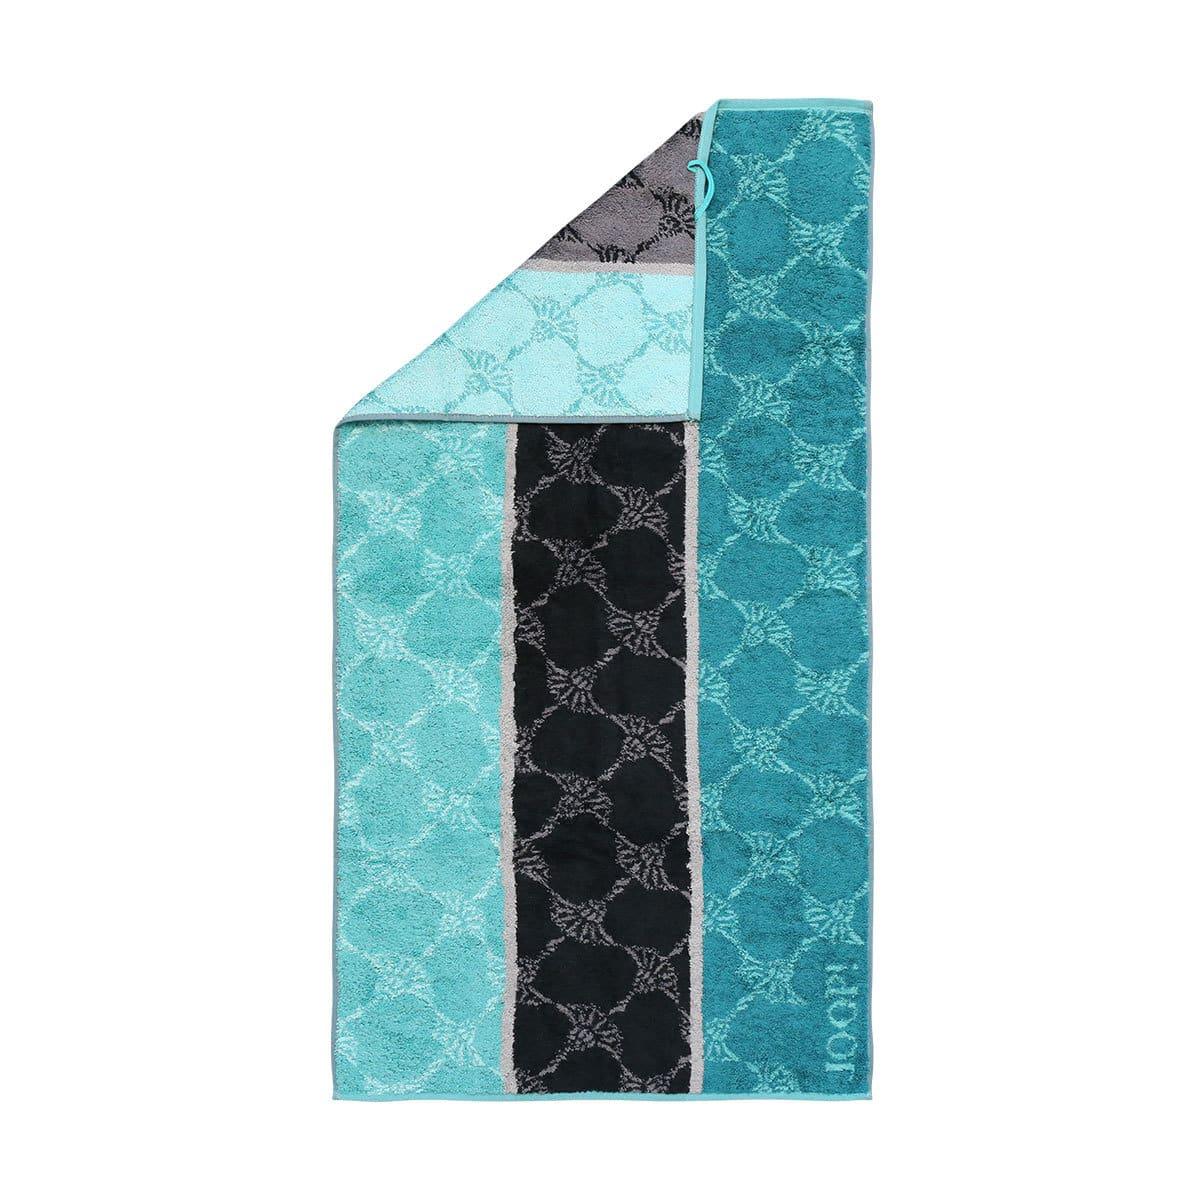 joop frottier handt cher signature cornflower stripes g nstig online kaufen bei bettwaren shop. Black Bedroom Furniture Sets. Home Design Ideas